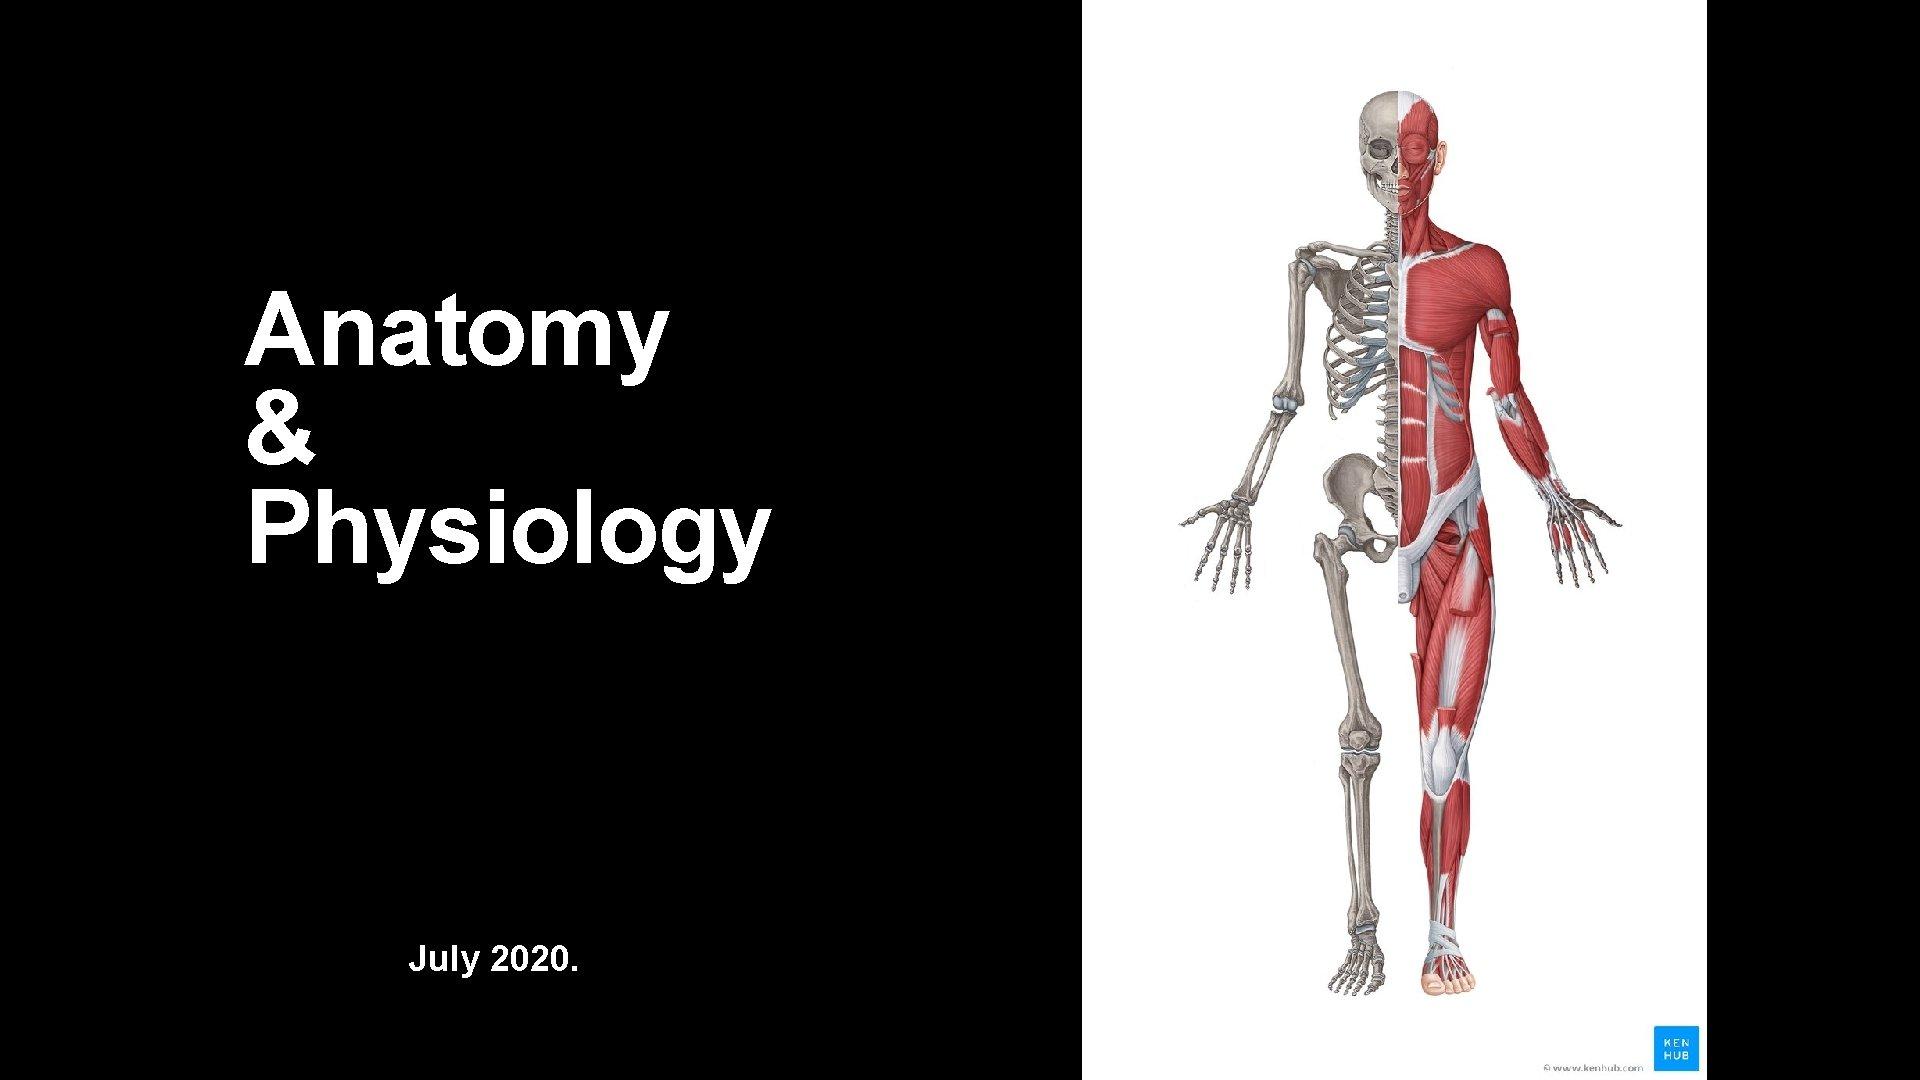 Anatomy & Physiology July 2020.